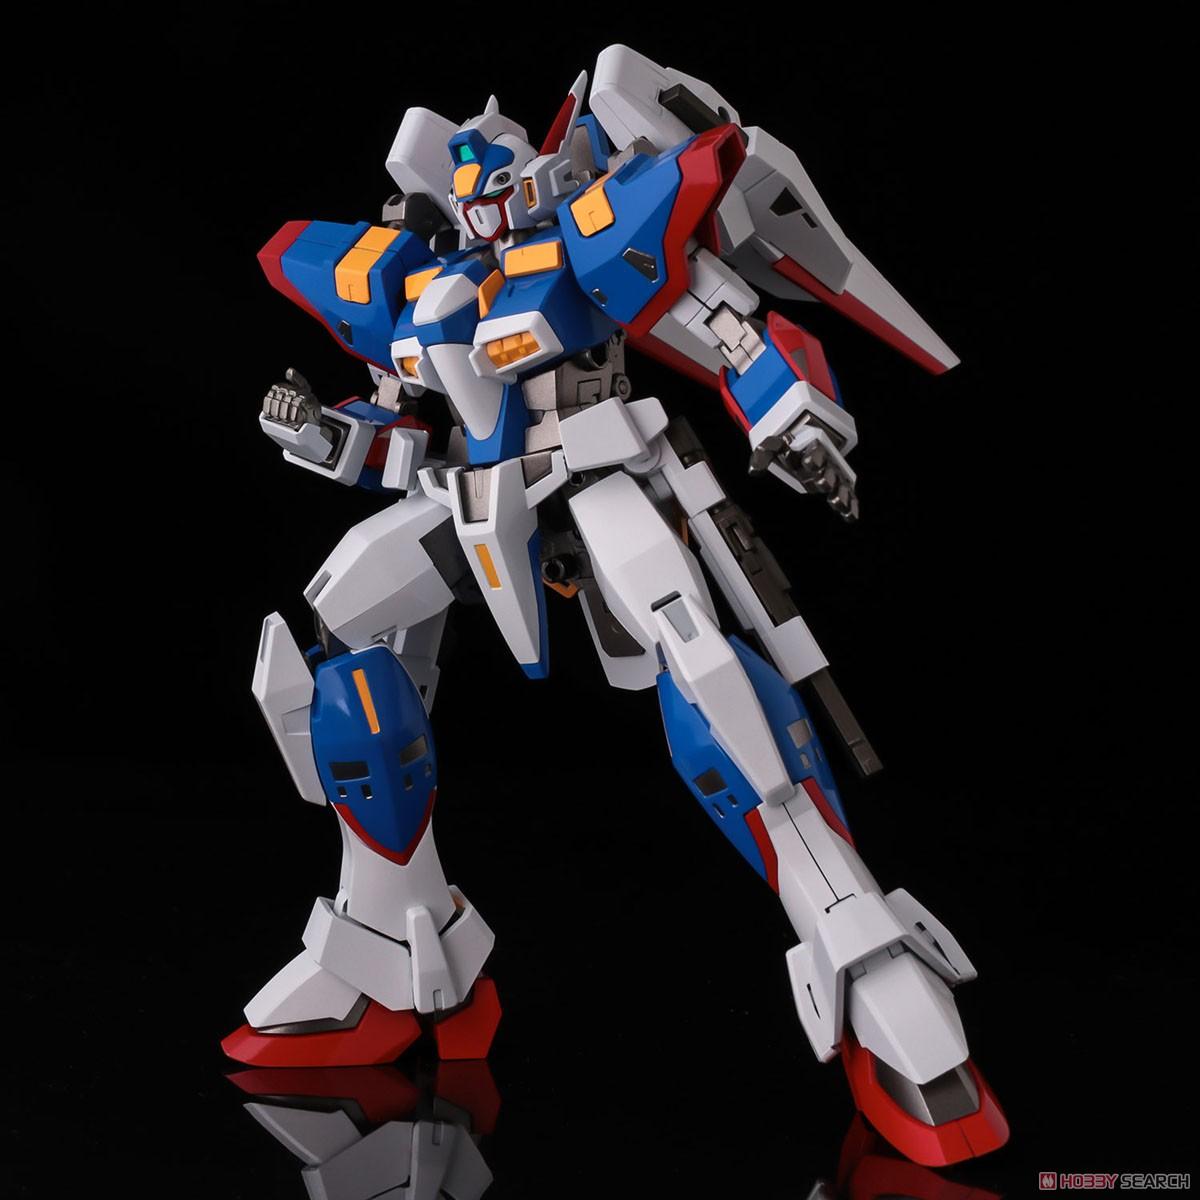 RIOBOT『変形合体 R-1』スーパーロボット大戦OG 可変合体フィギュア-013